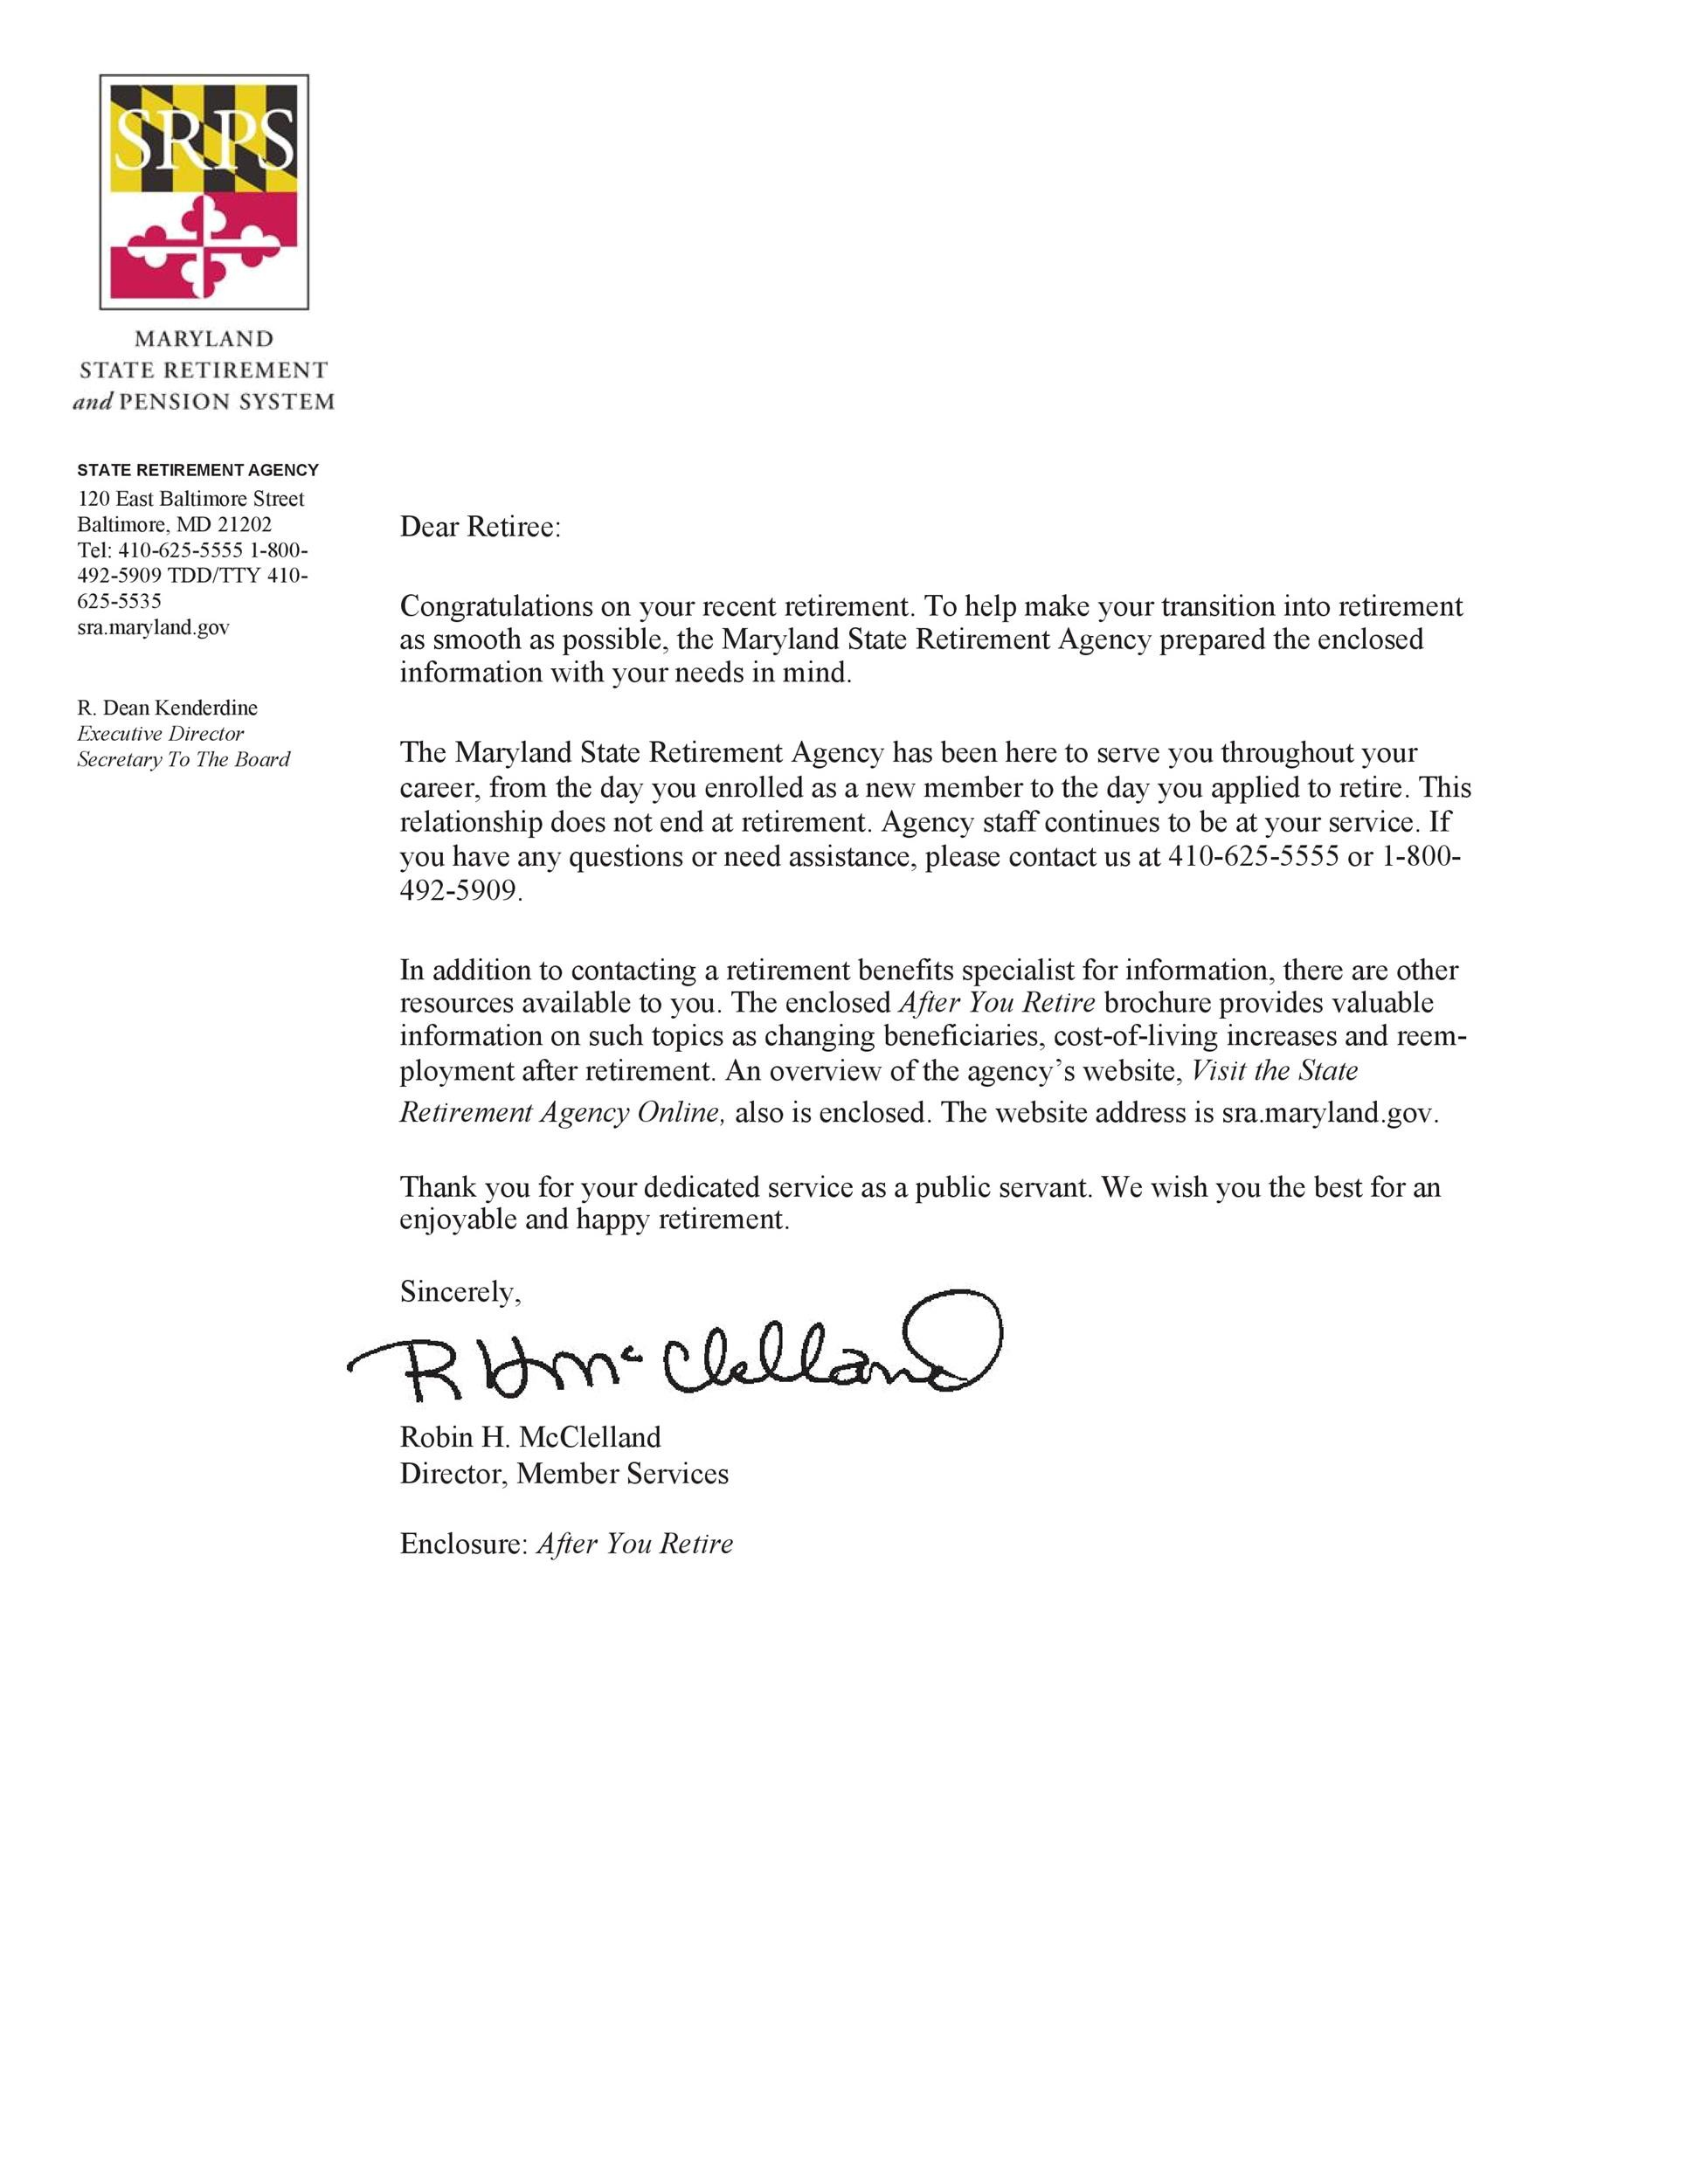 Free congratulations letter 01